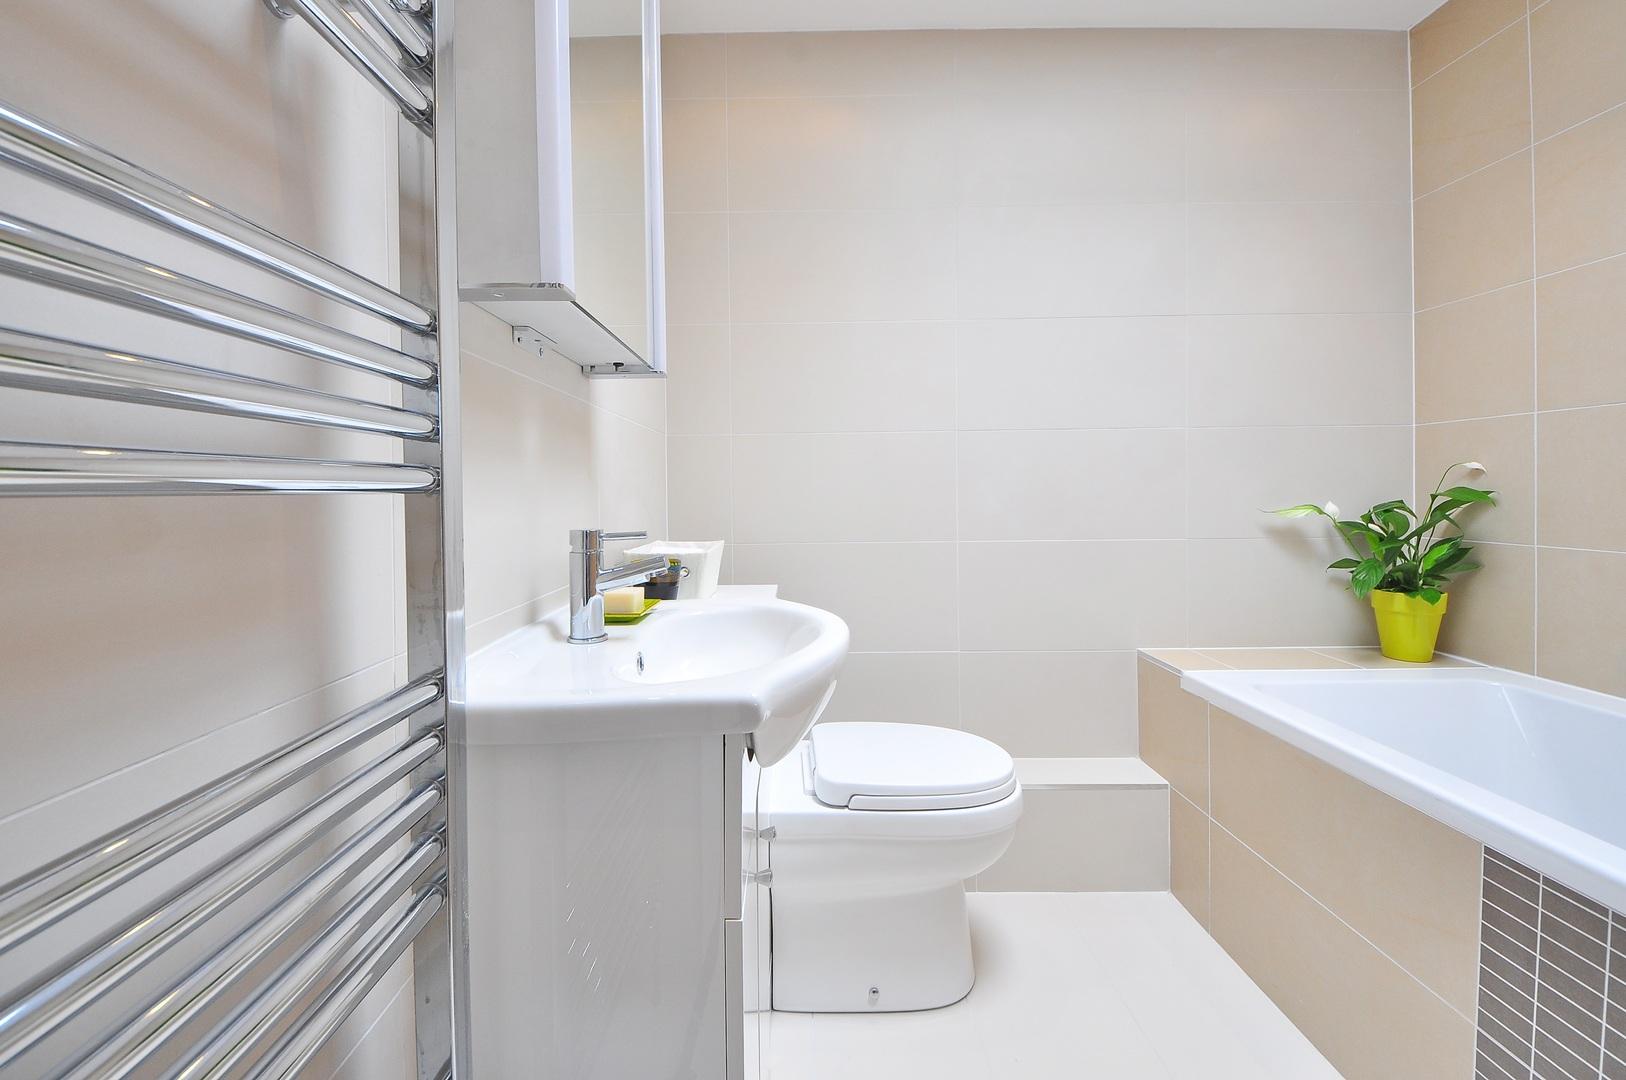 Badkamer - De snelste vakman in je buurt!